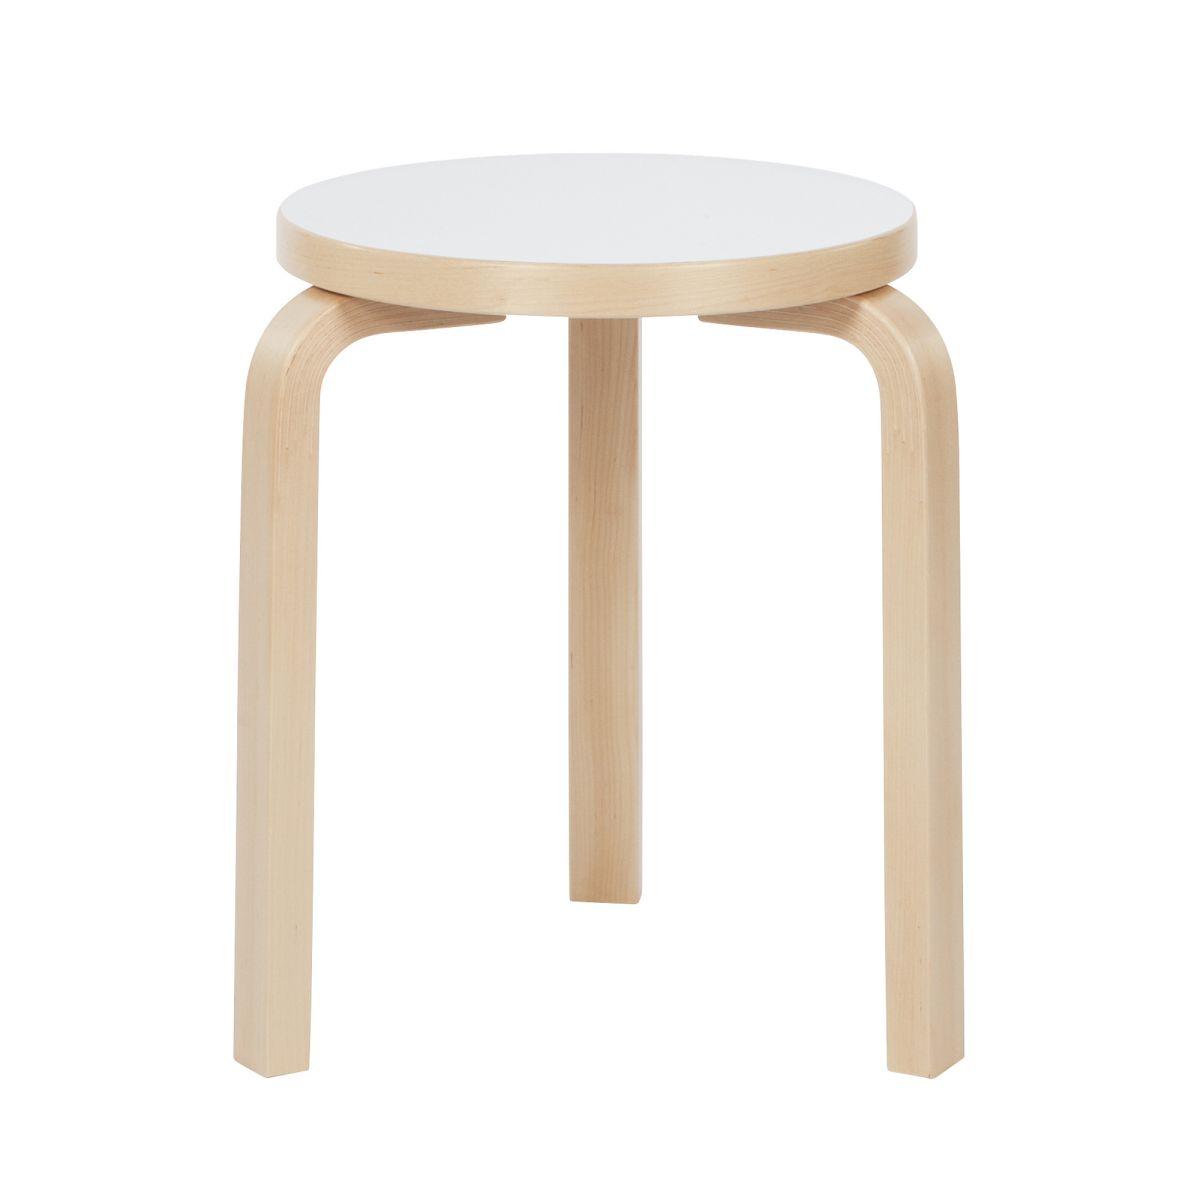 Stool-60-Legs-Birch-Seat-White-Hpl-2157368